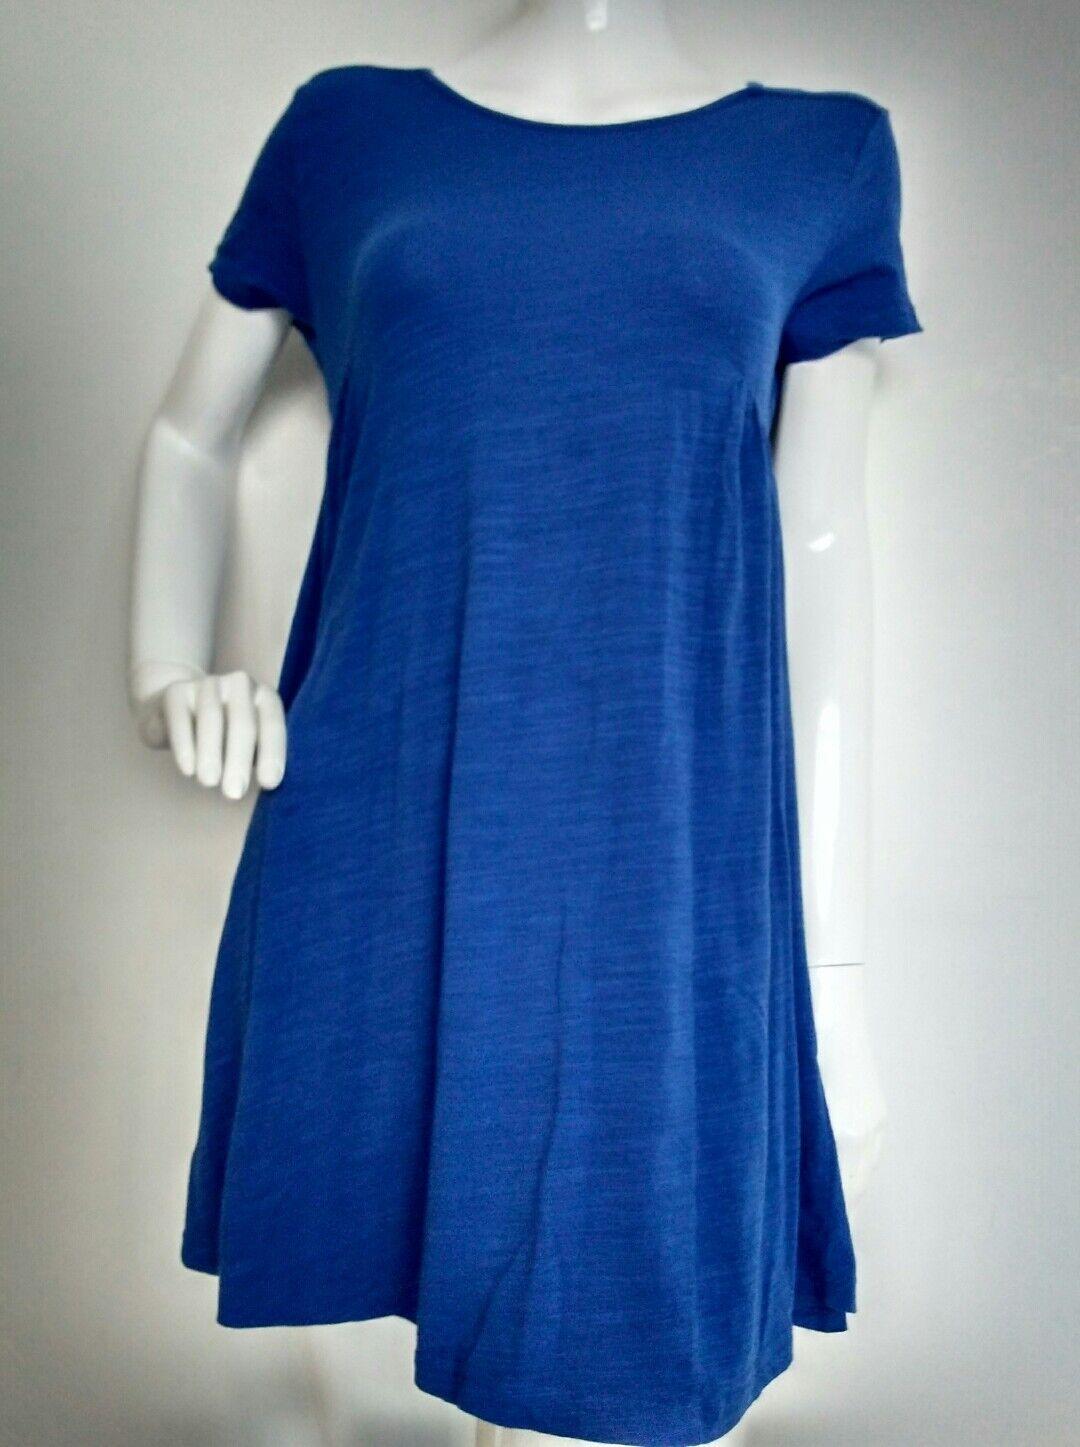 HUSH loose casual jersey dress size XS --VGC-- short sleeve cotton blend